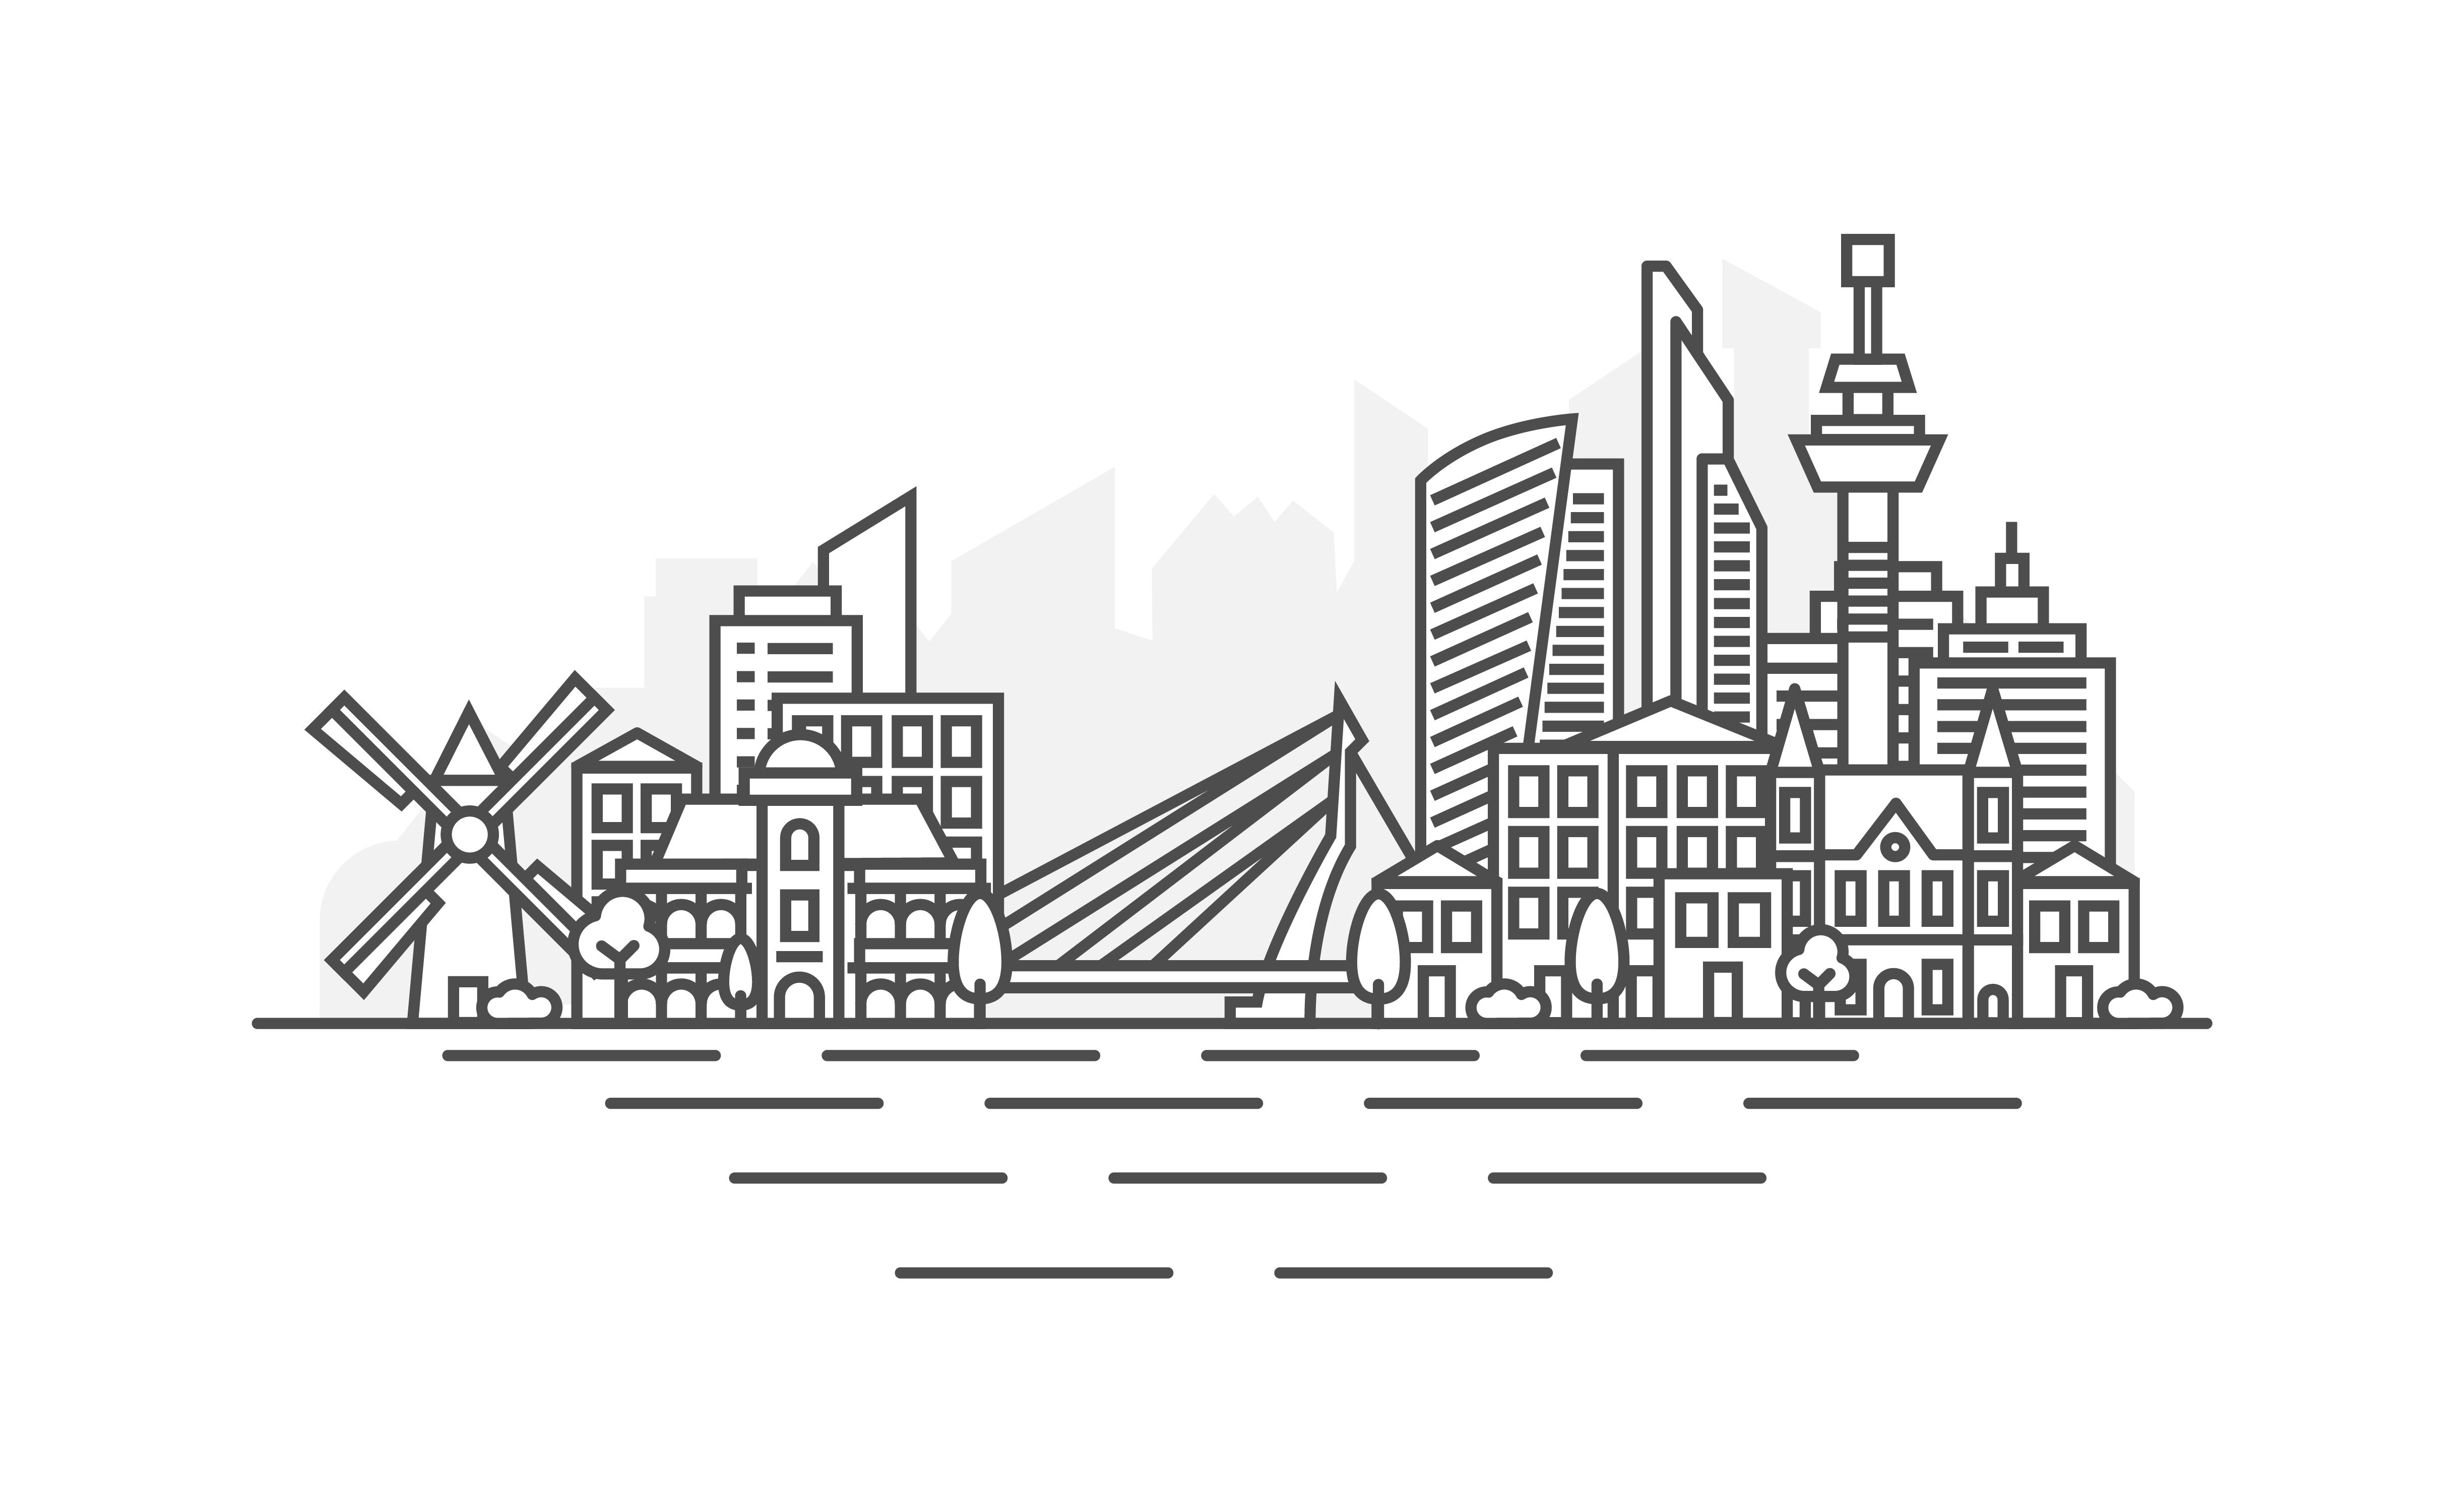 Rotterdam-Skyline-IDUG-2019-1391173937